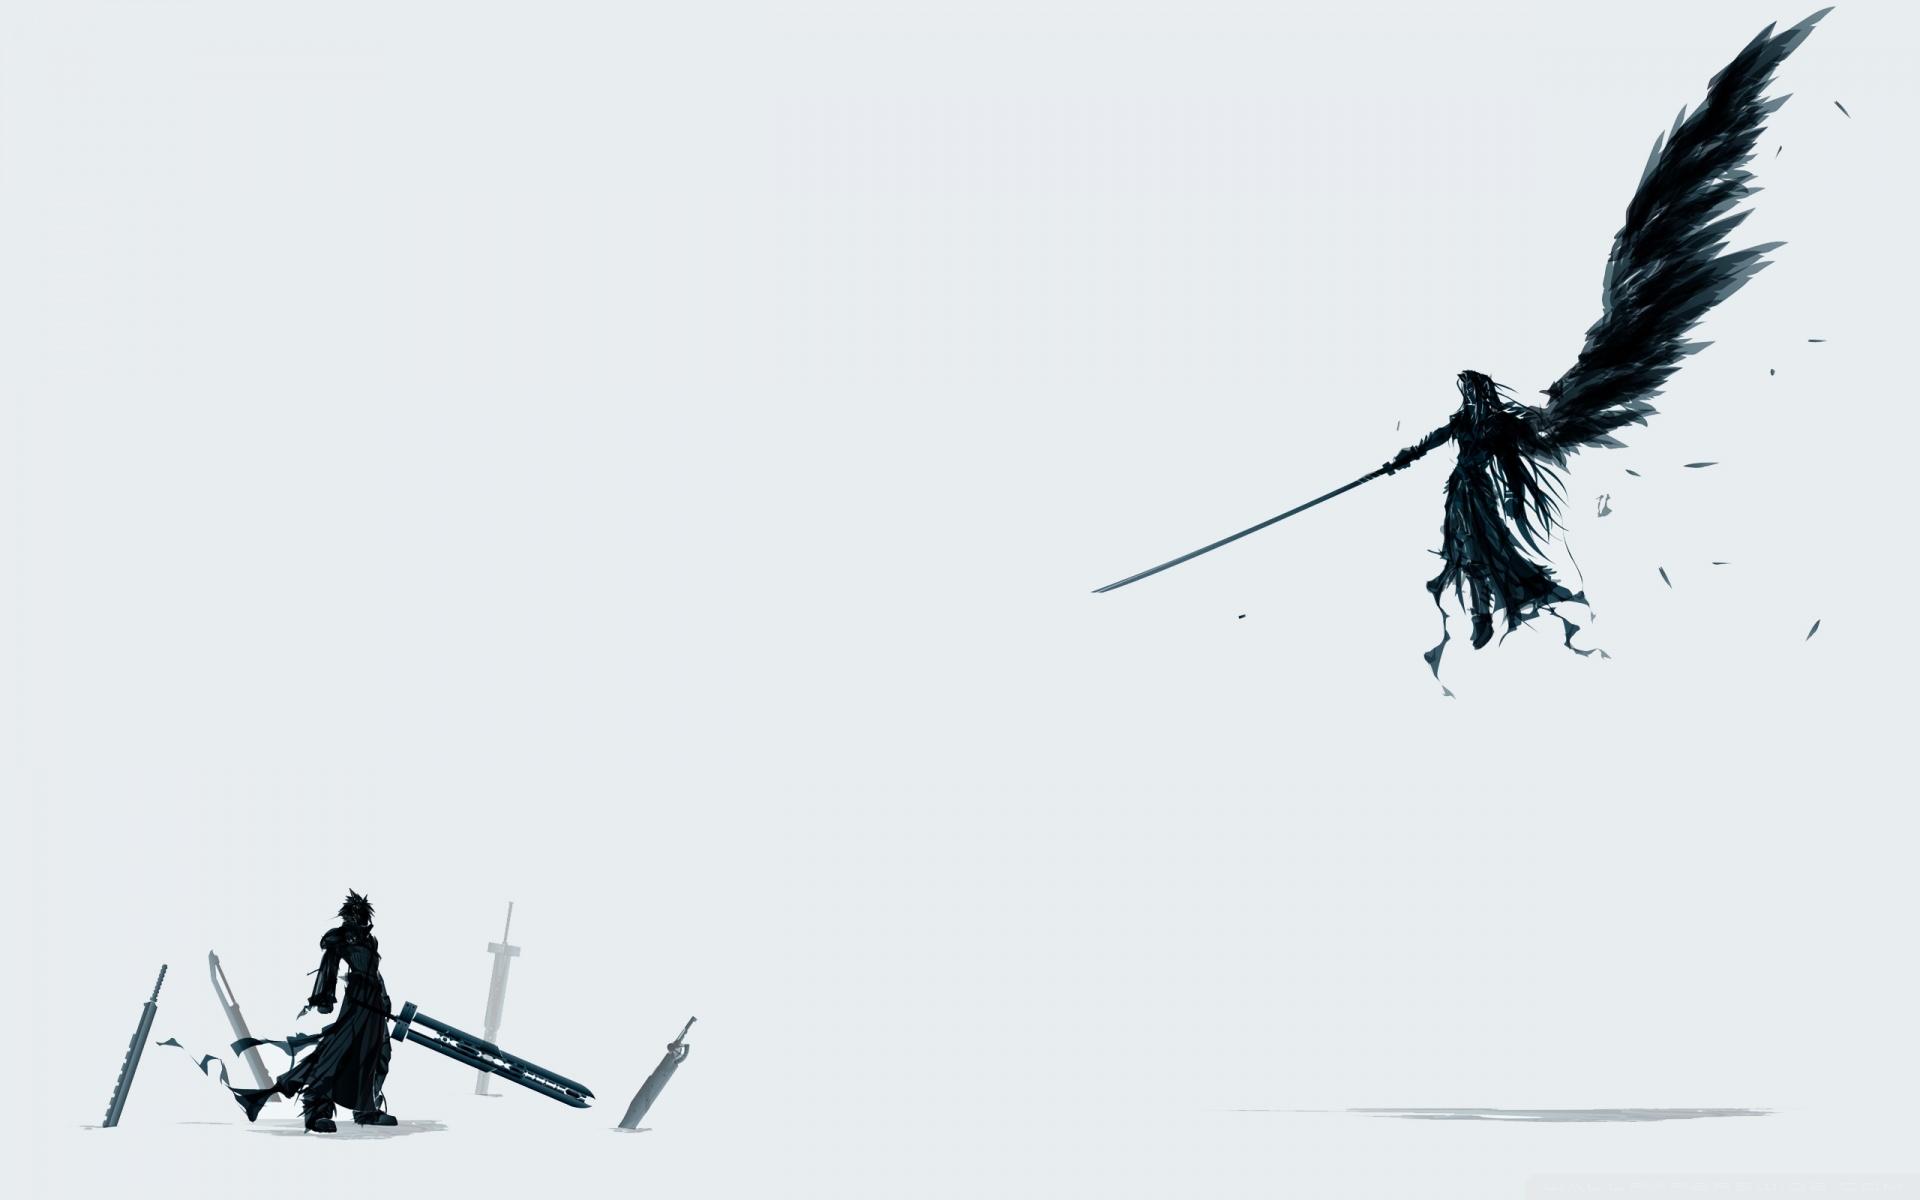 dark_angel_anime-wallpaper-1920x1200